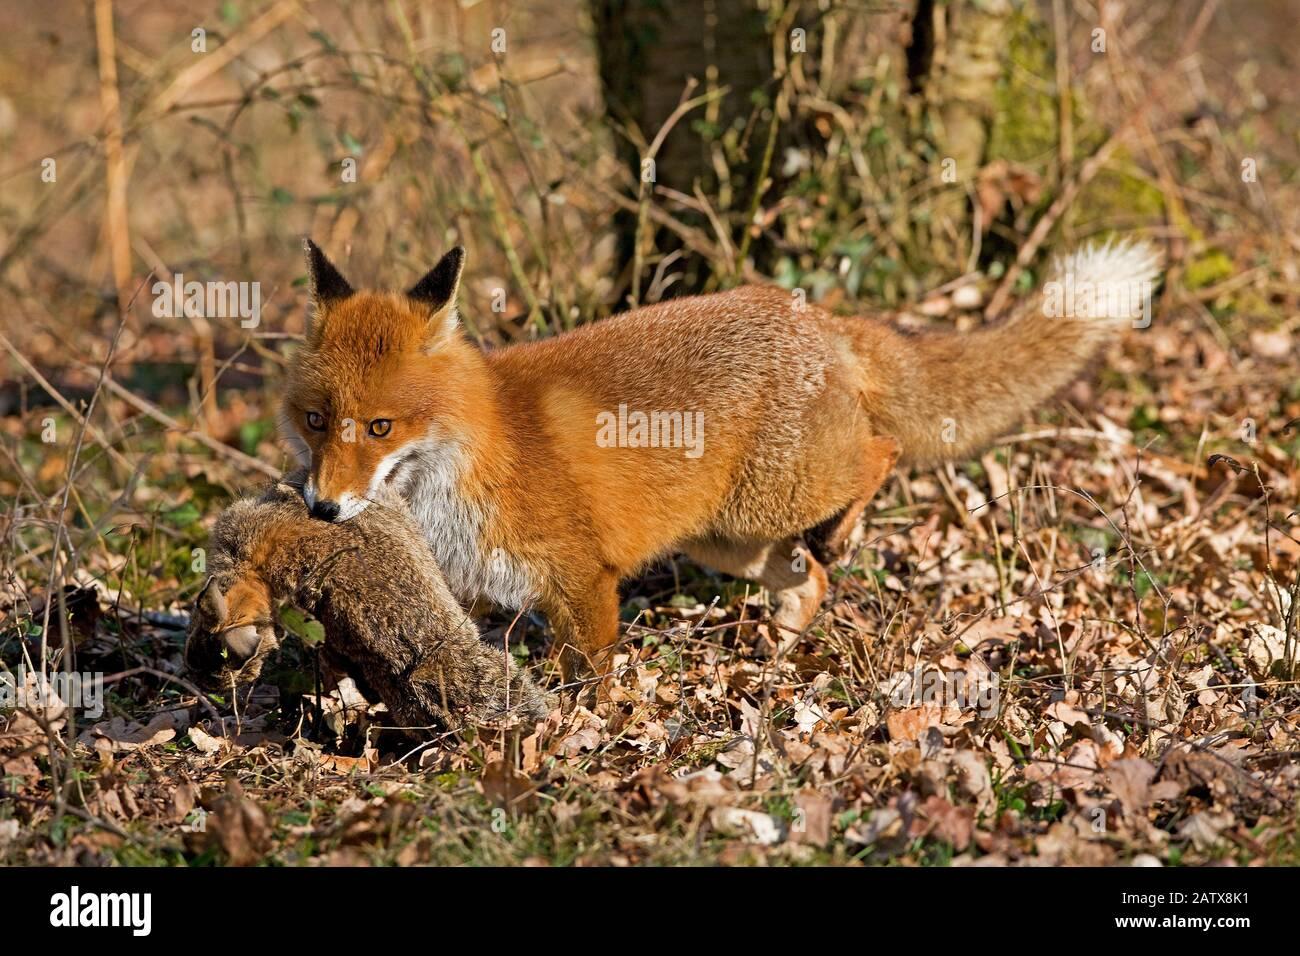 Le renard roux, Vulpes vulpes, homme chasse lapin sauvage, Normandie Banque D'Images